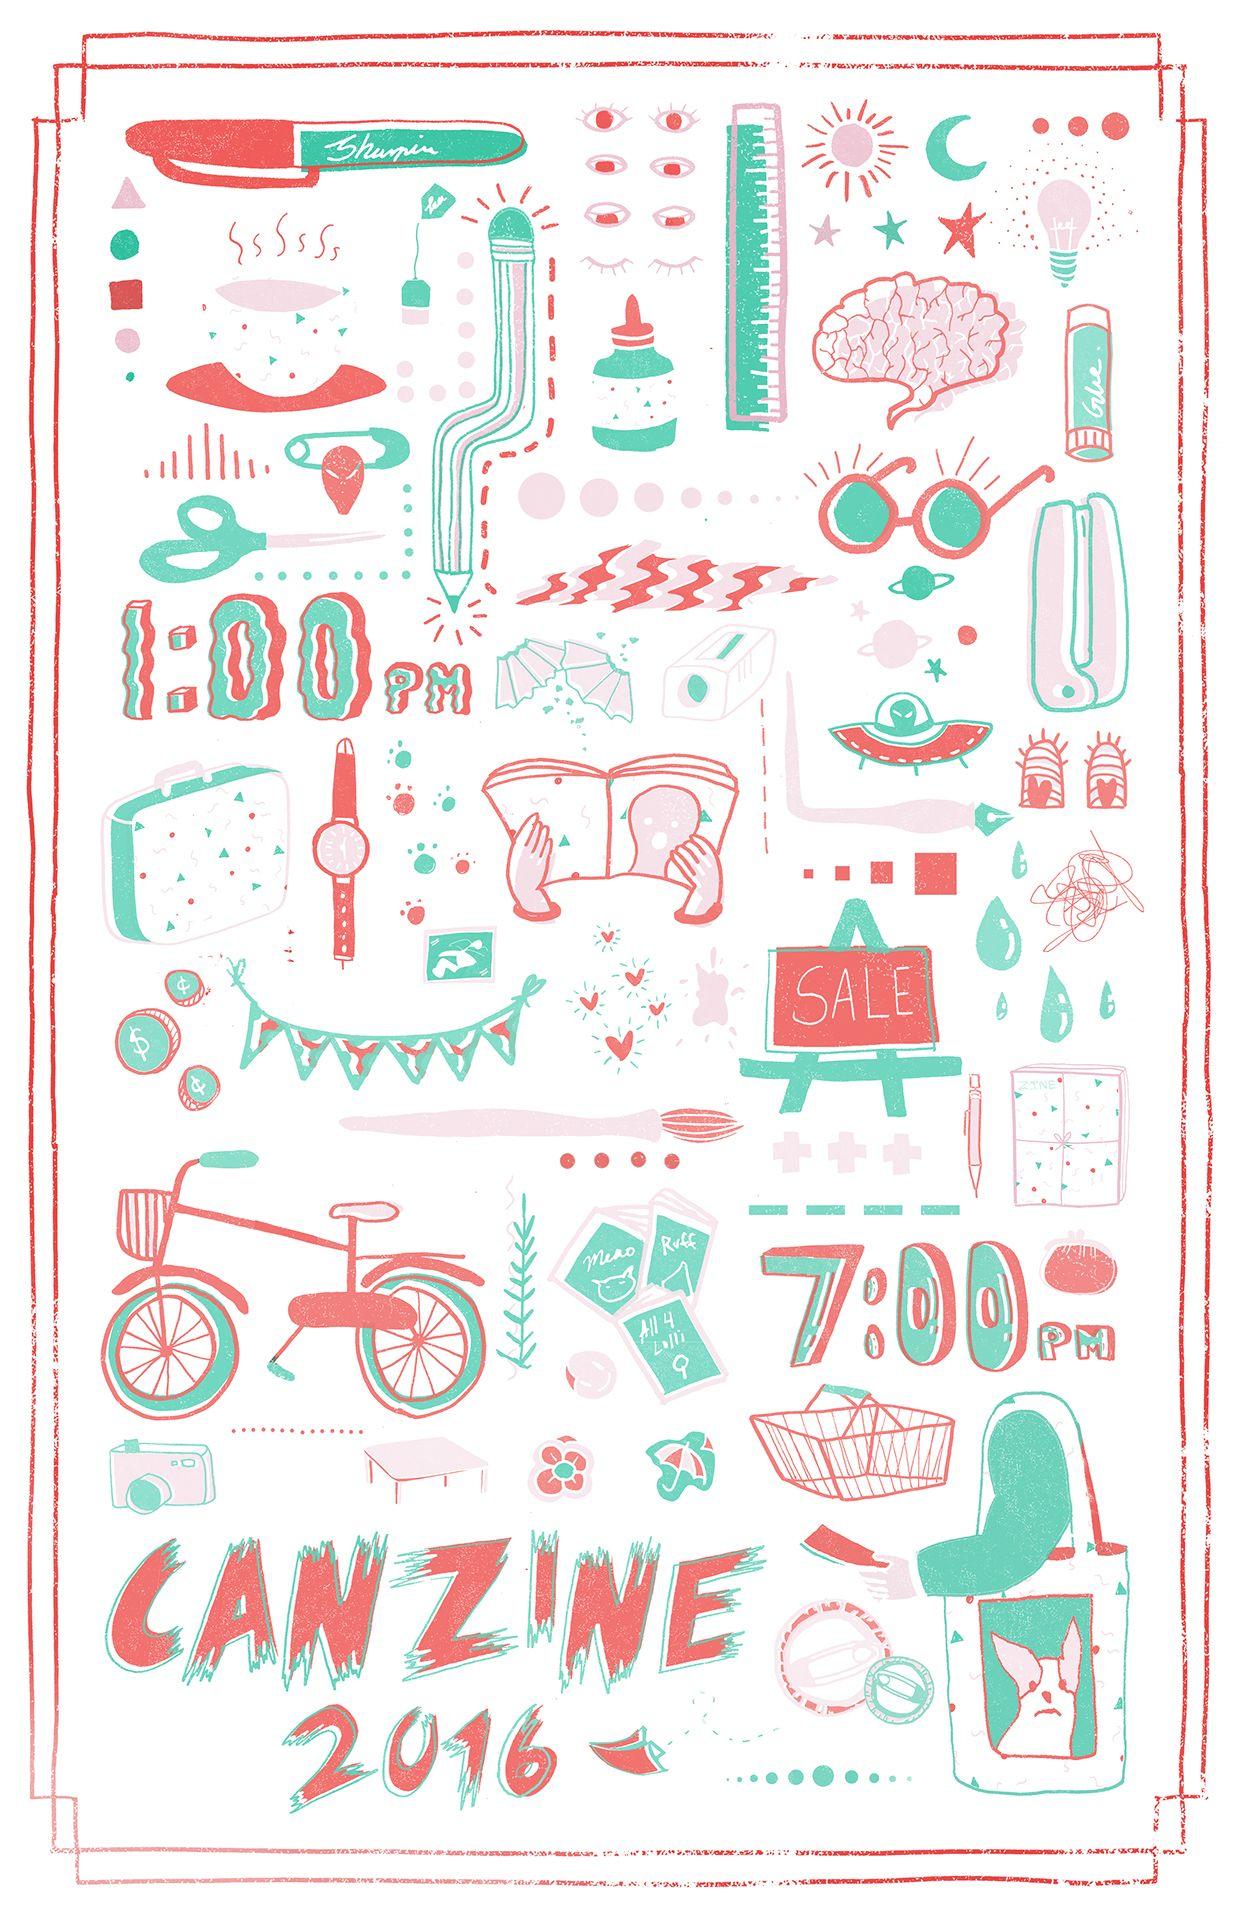 canzine 2016 on behance likelike graphic illustration. Black Bedroom Furniture Sets. Home Design Ideas